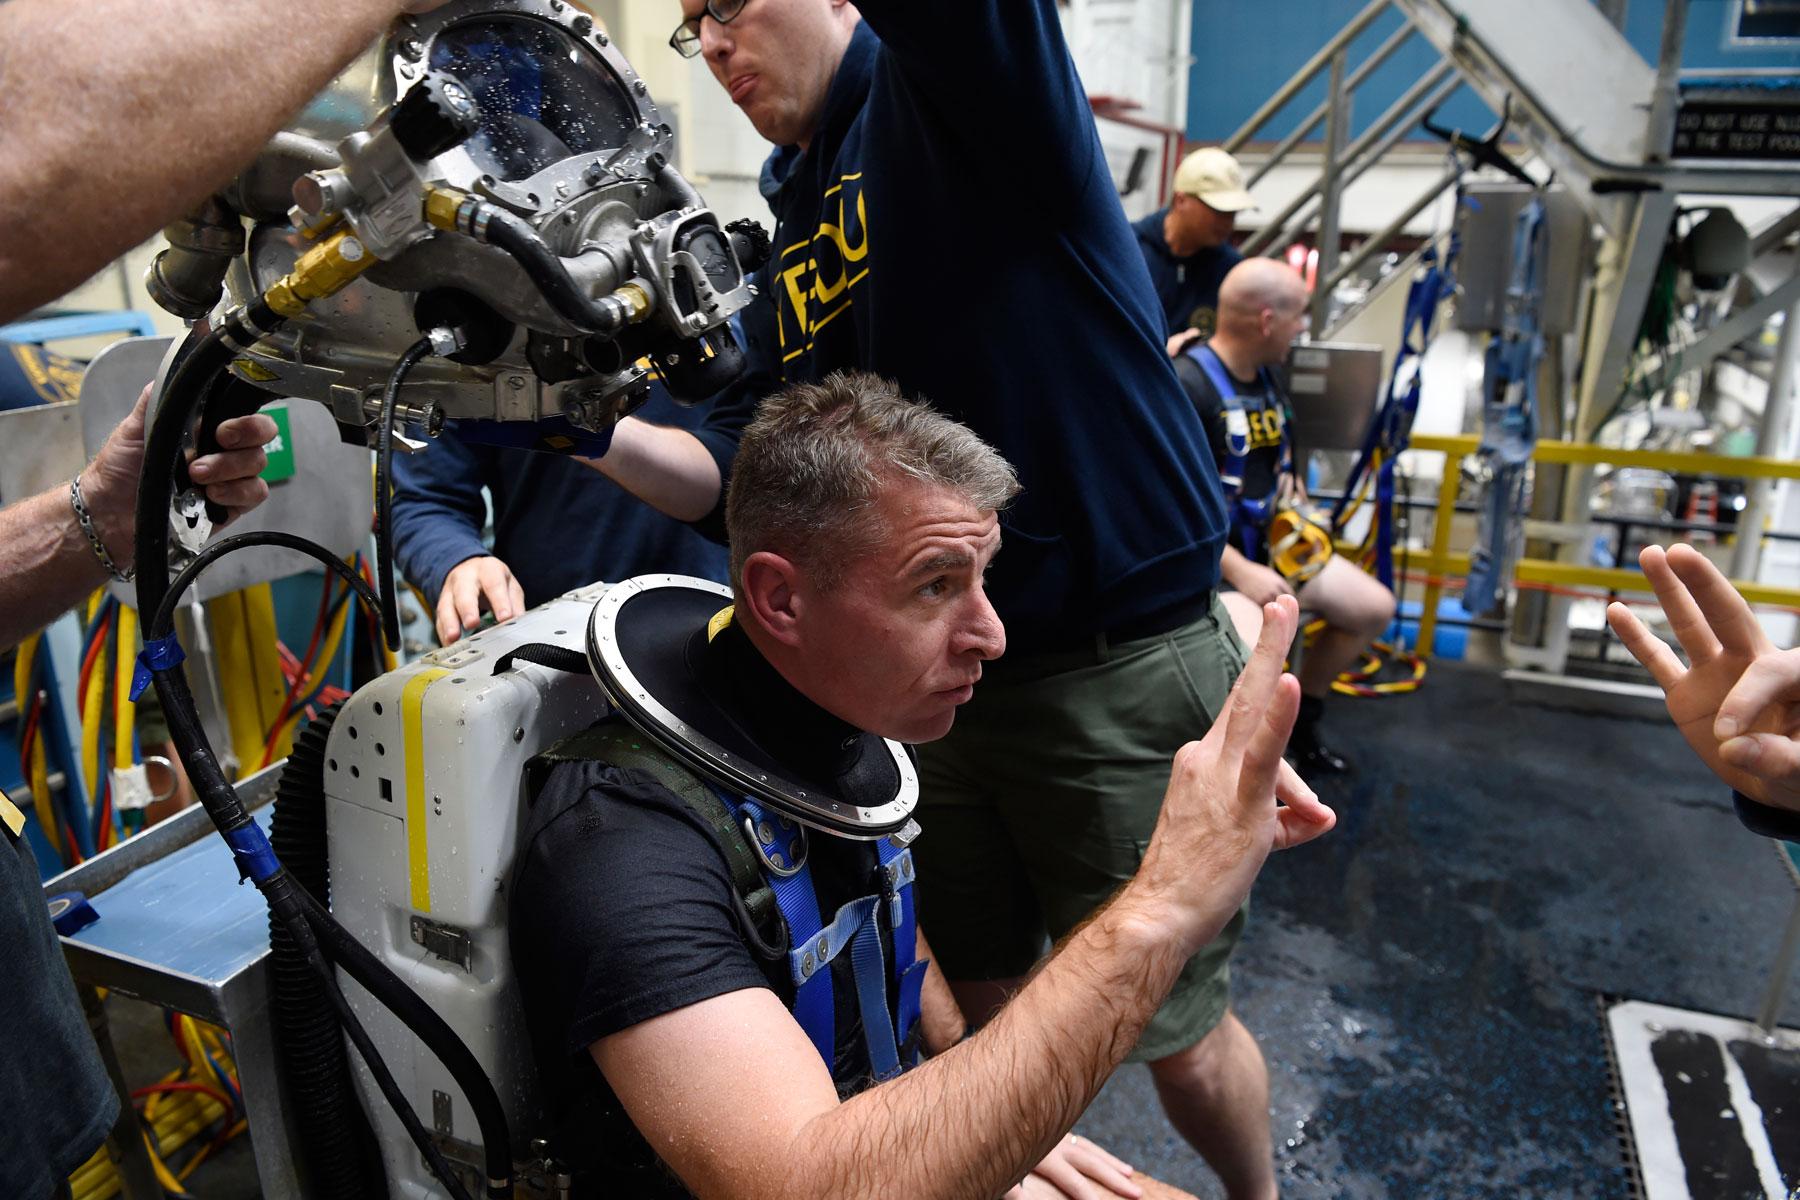 new  u0026 39 rebreather u0026 39  helps navy divers beneath the waves